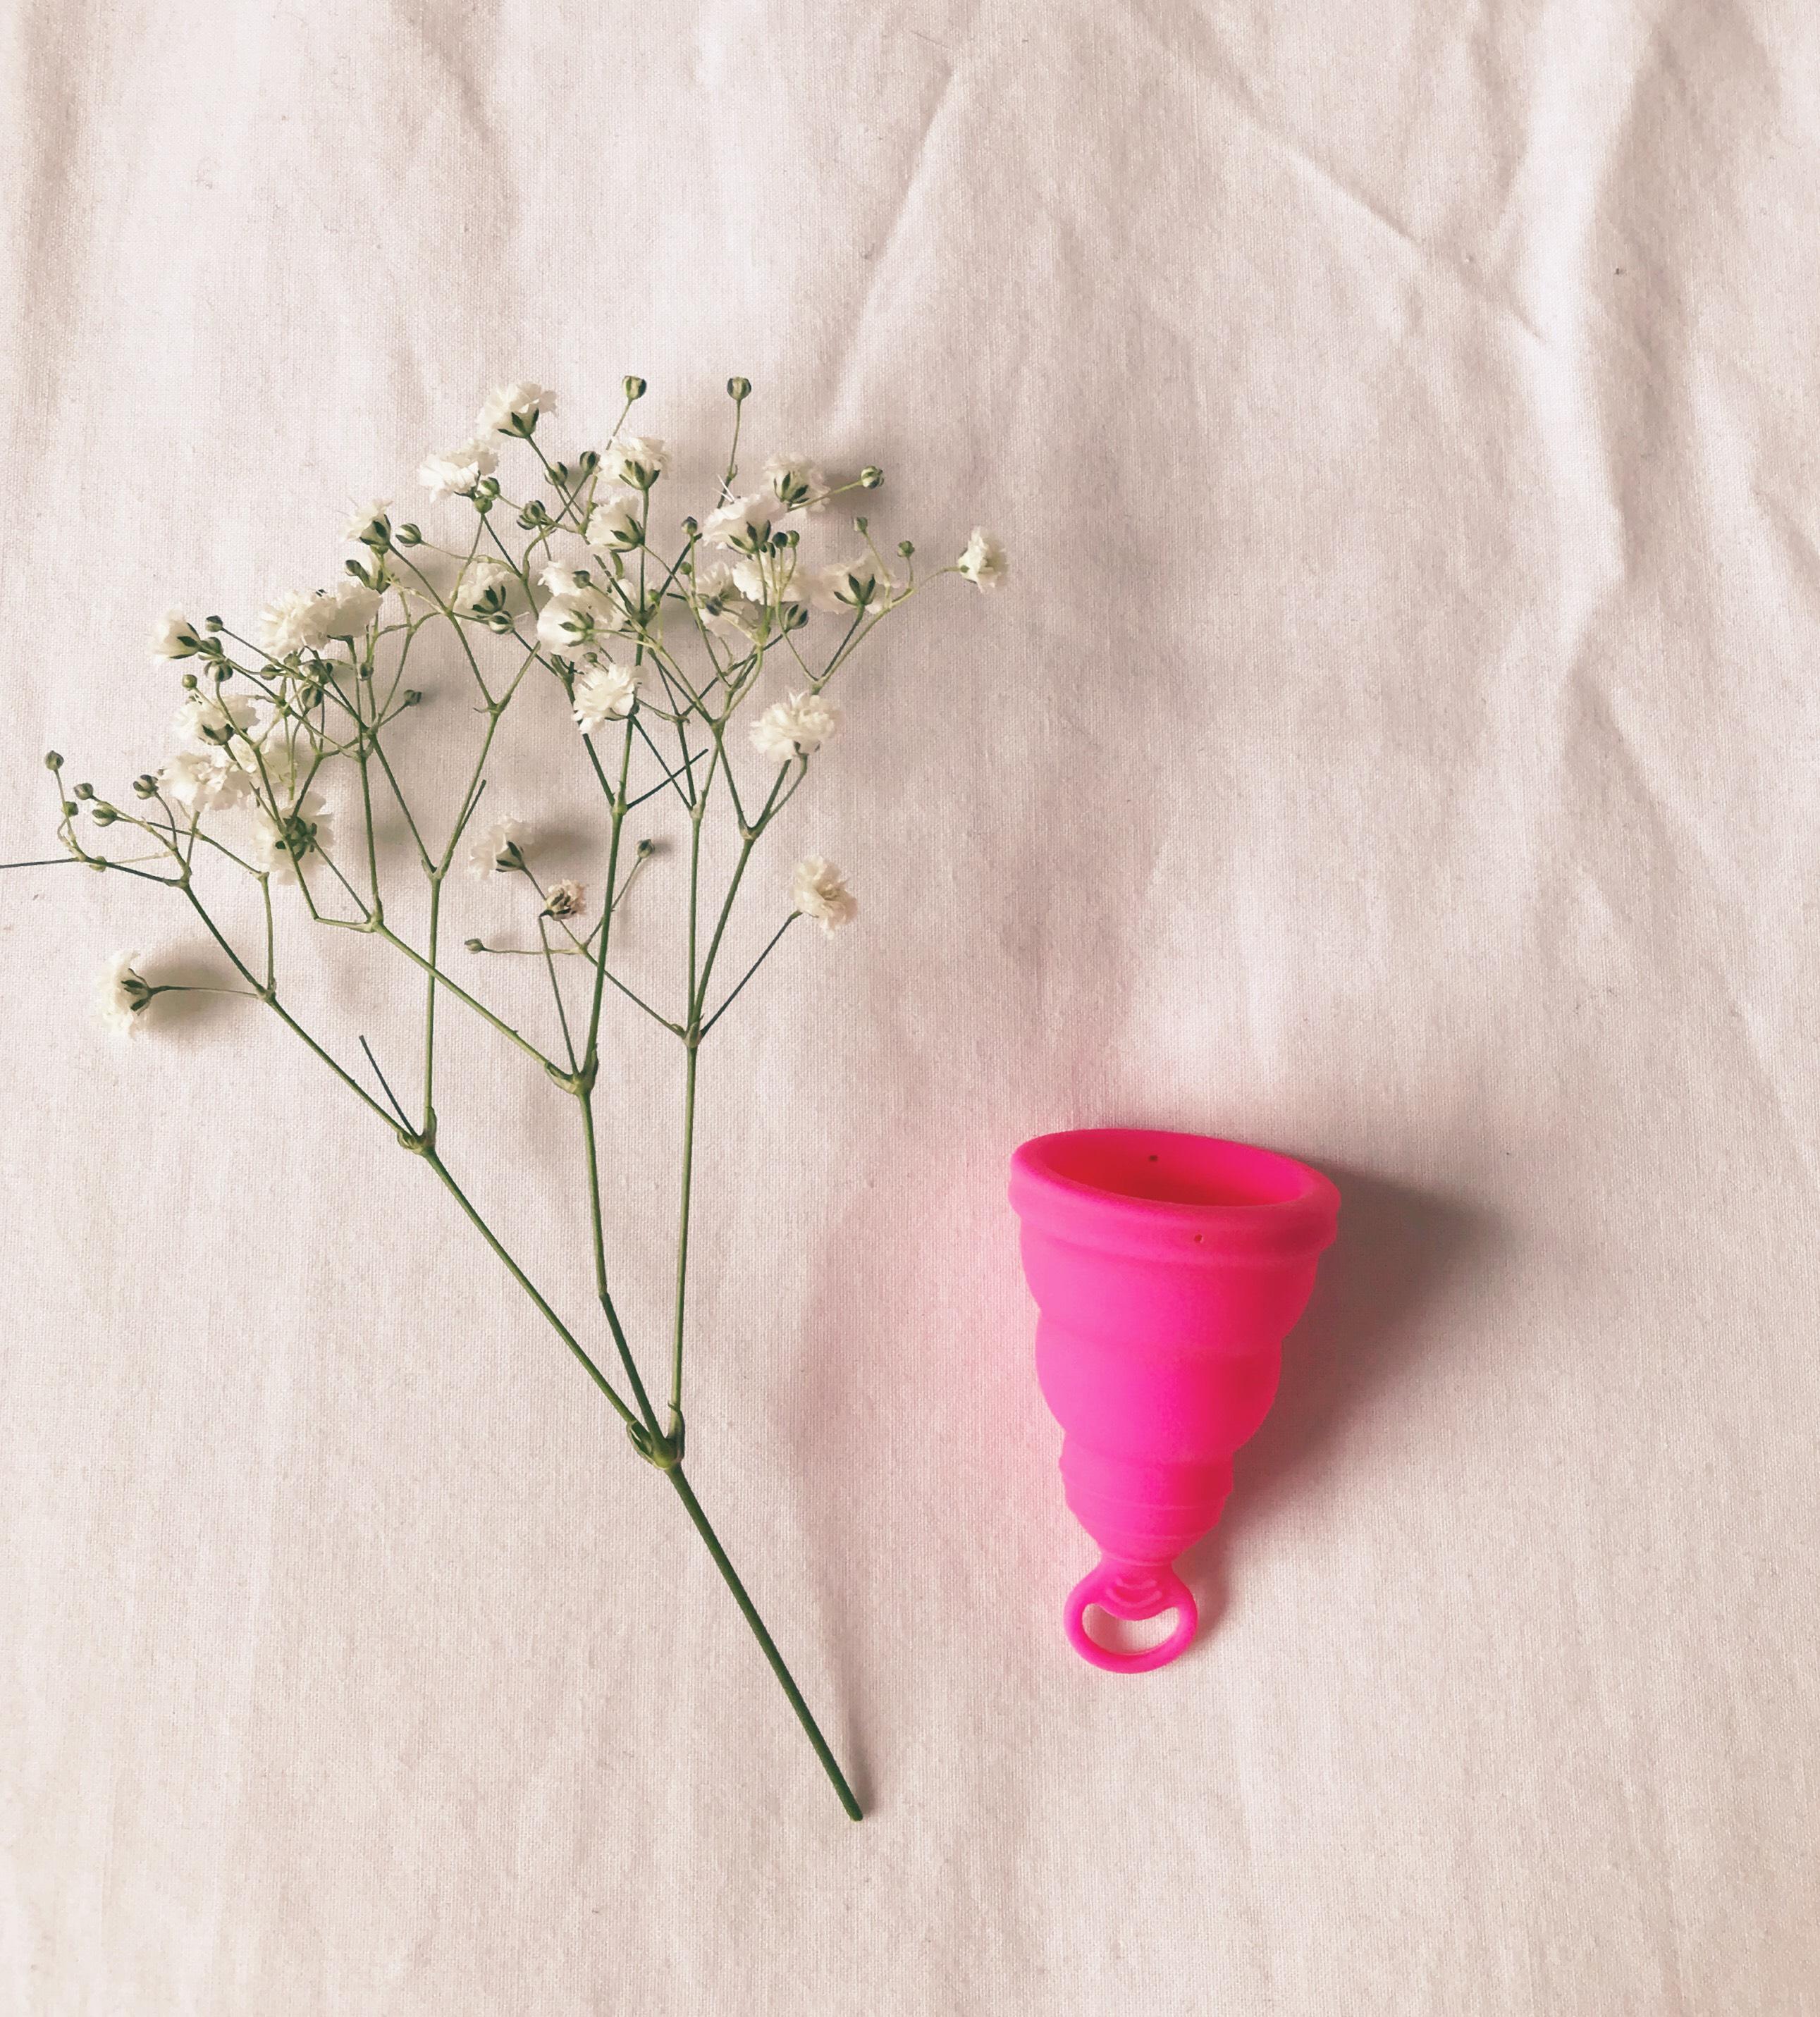 menstural-cup-1